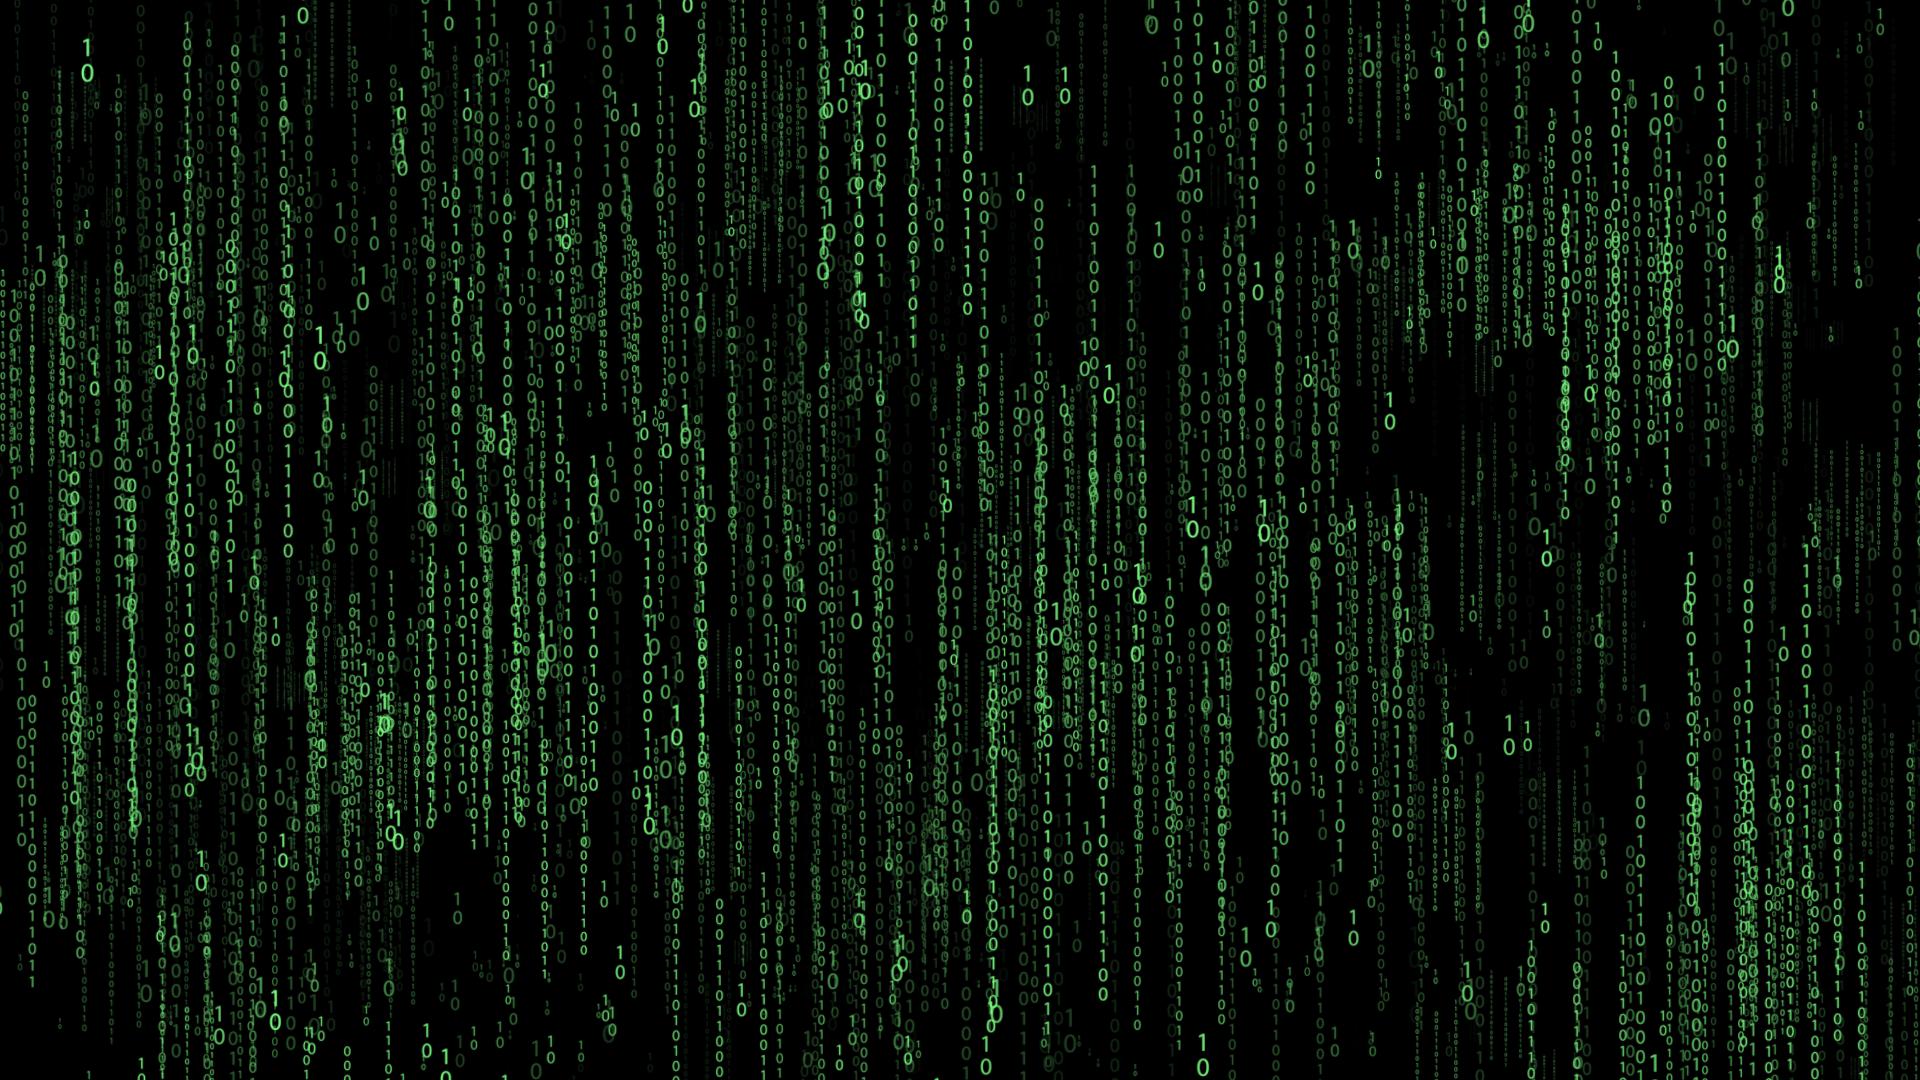 Matrix Computer Desktop Backgrounds Computer Desktop Backgrounds Desktop Background Pattern Backgrounds Desktop